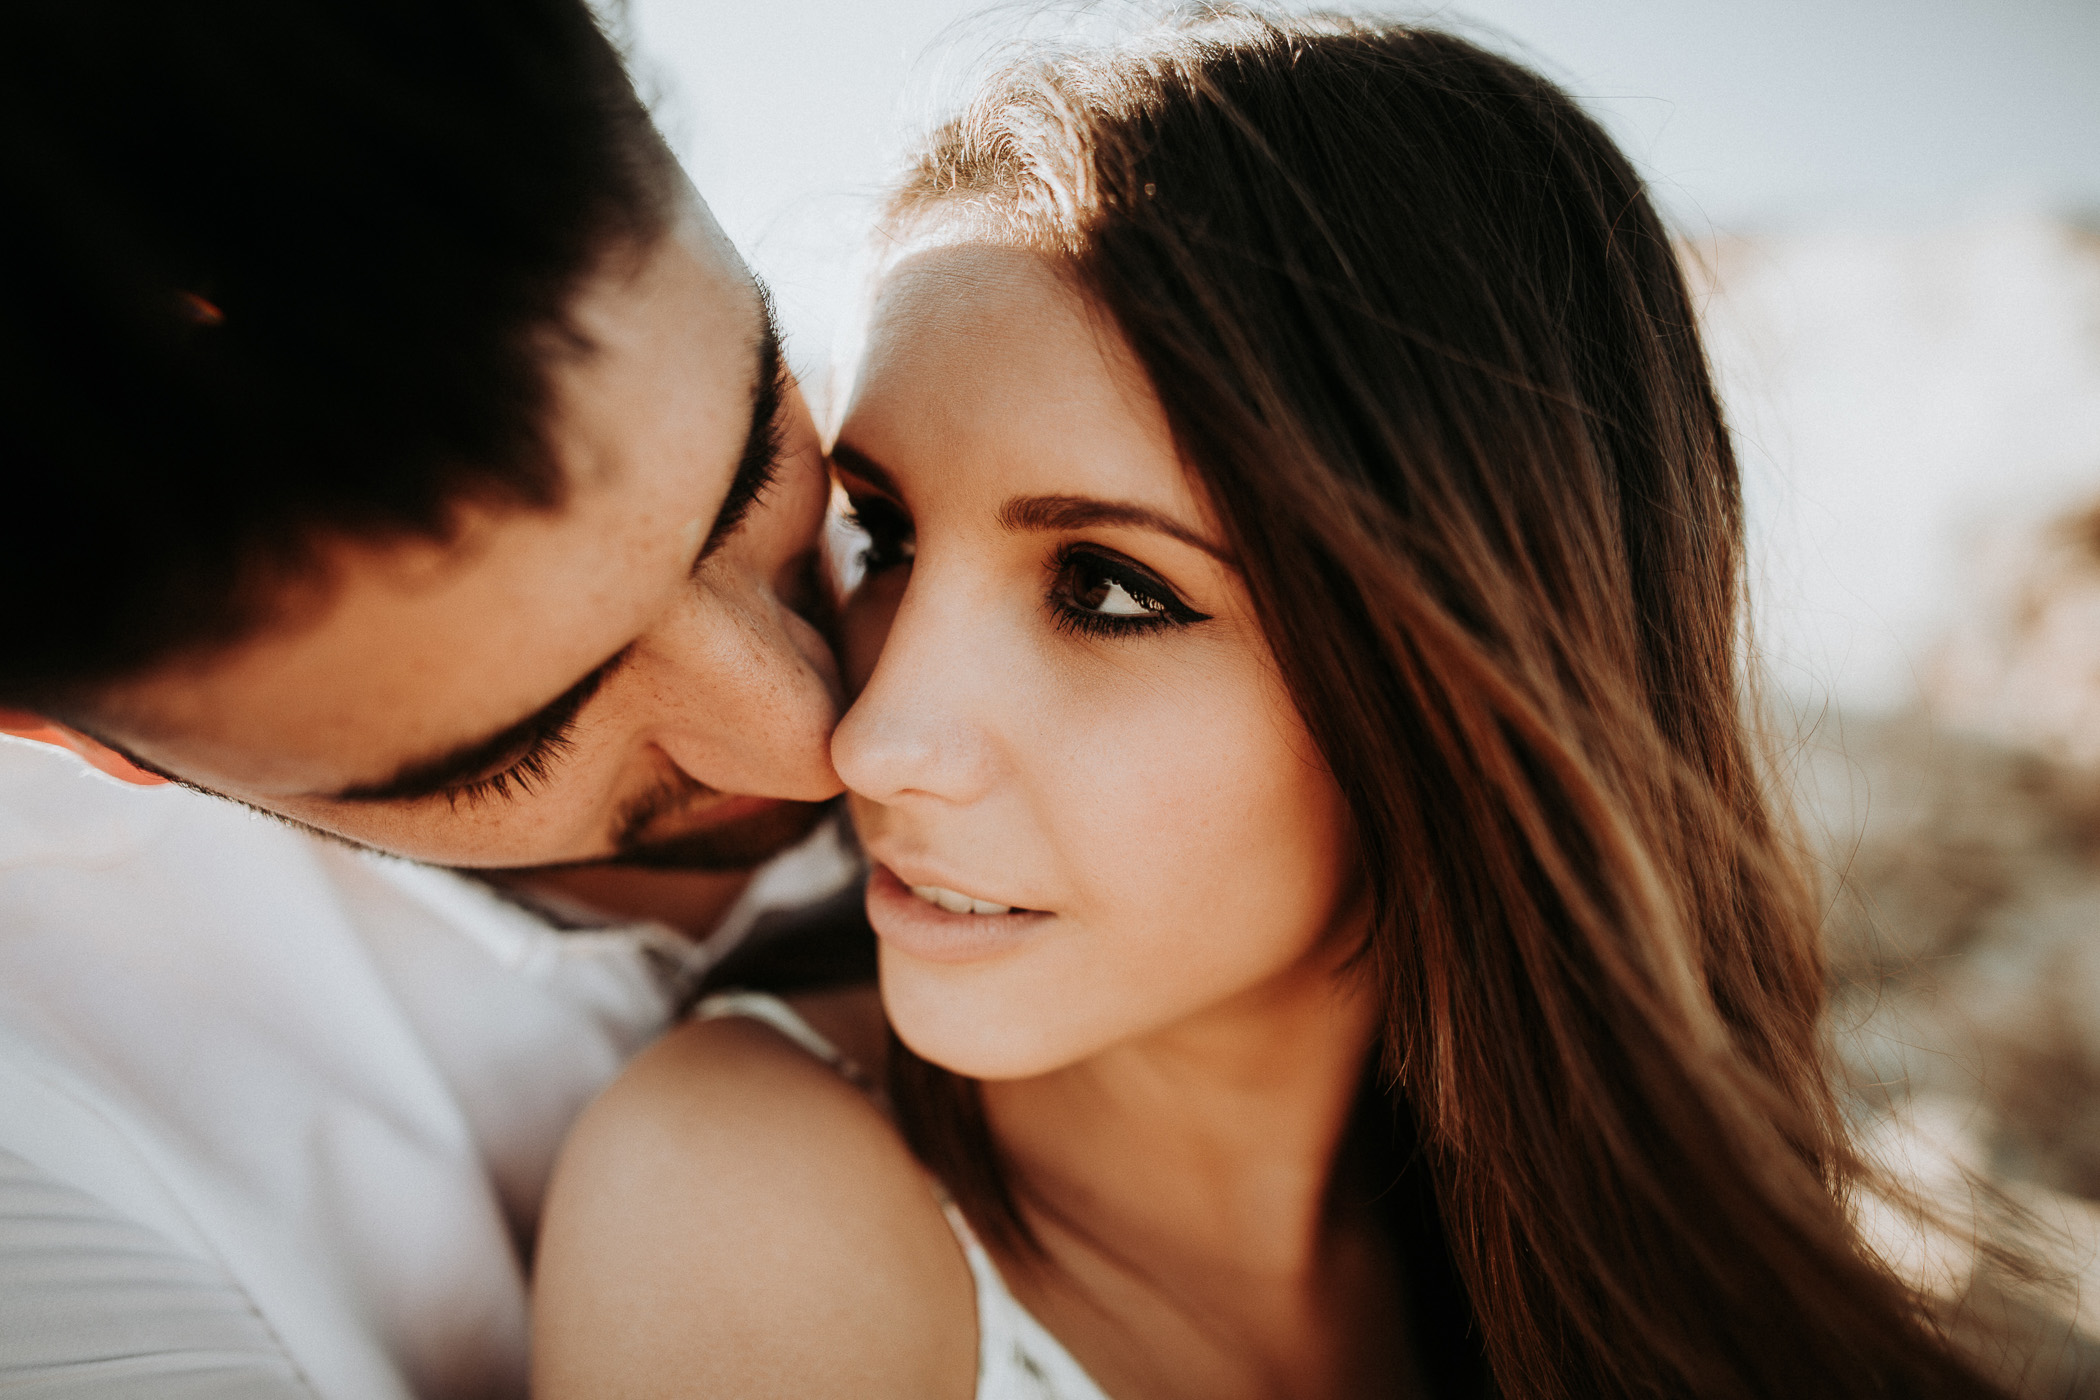 DanielaMarquardtPhotography_wedding_elopement_mallorca_spain_calapi_palma_lauraandtoni_385